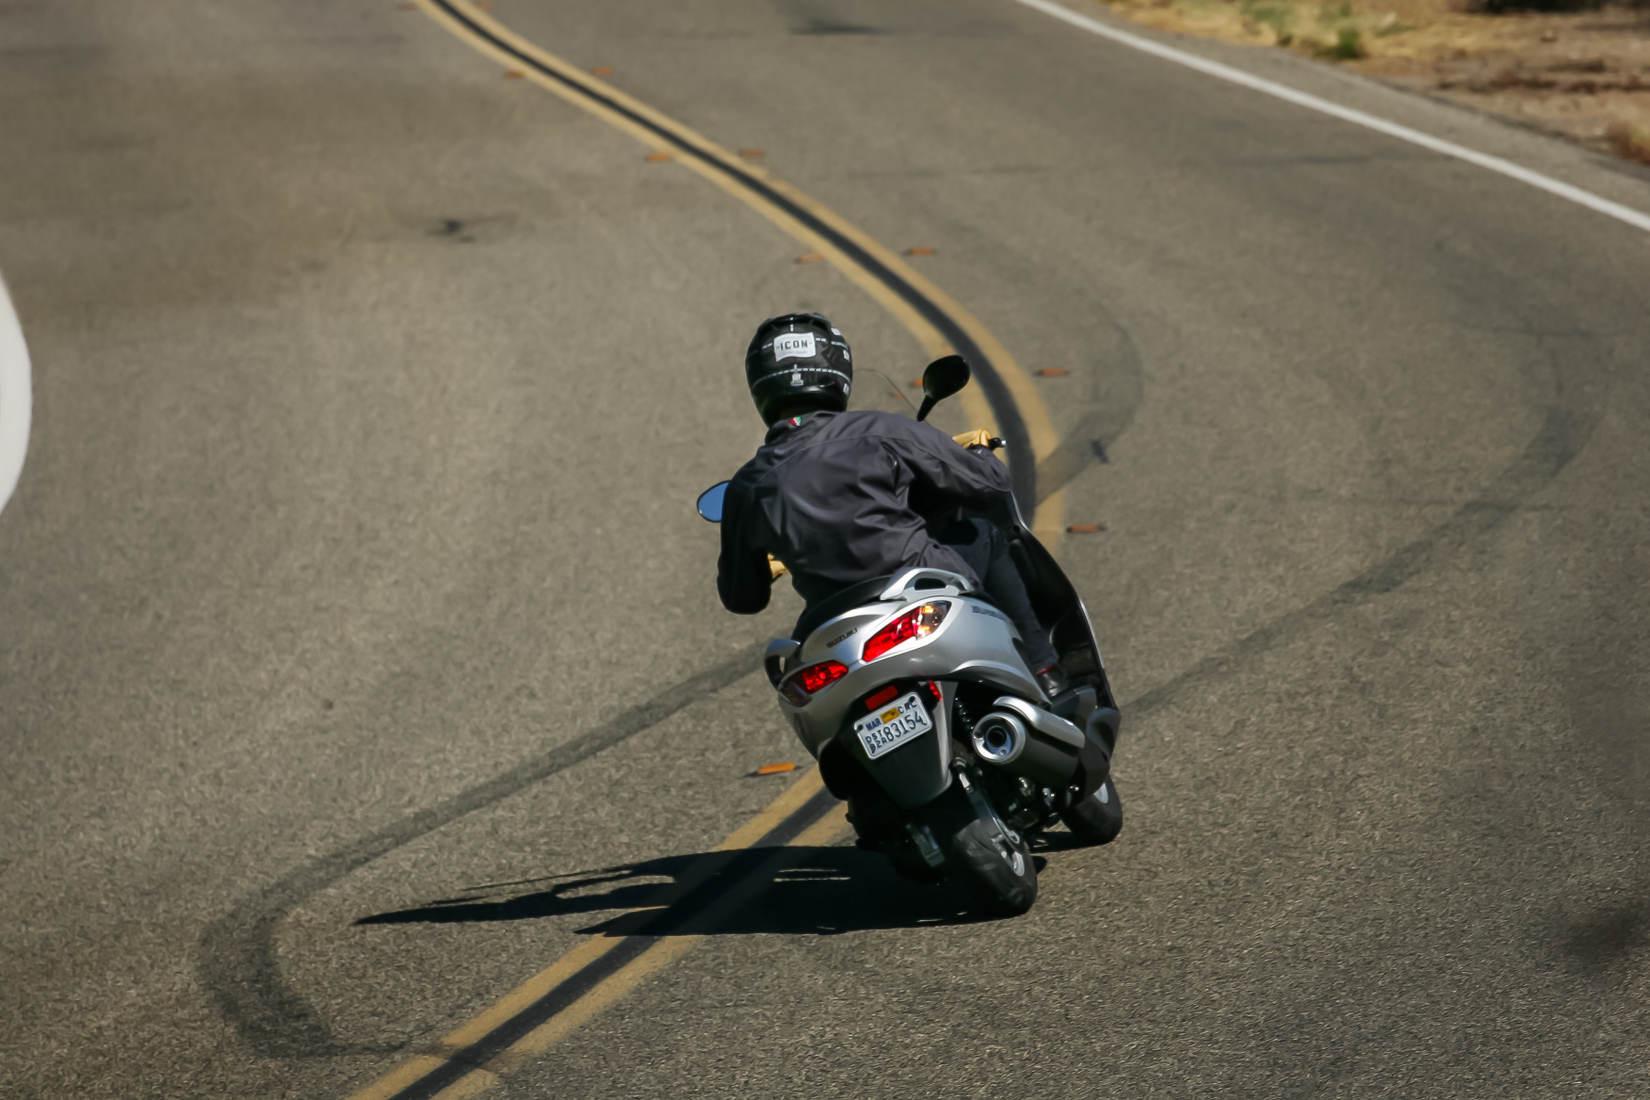 MD First Ride: 2014 Suzuki Burgman 200 - MotorcycleDaily com